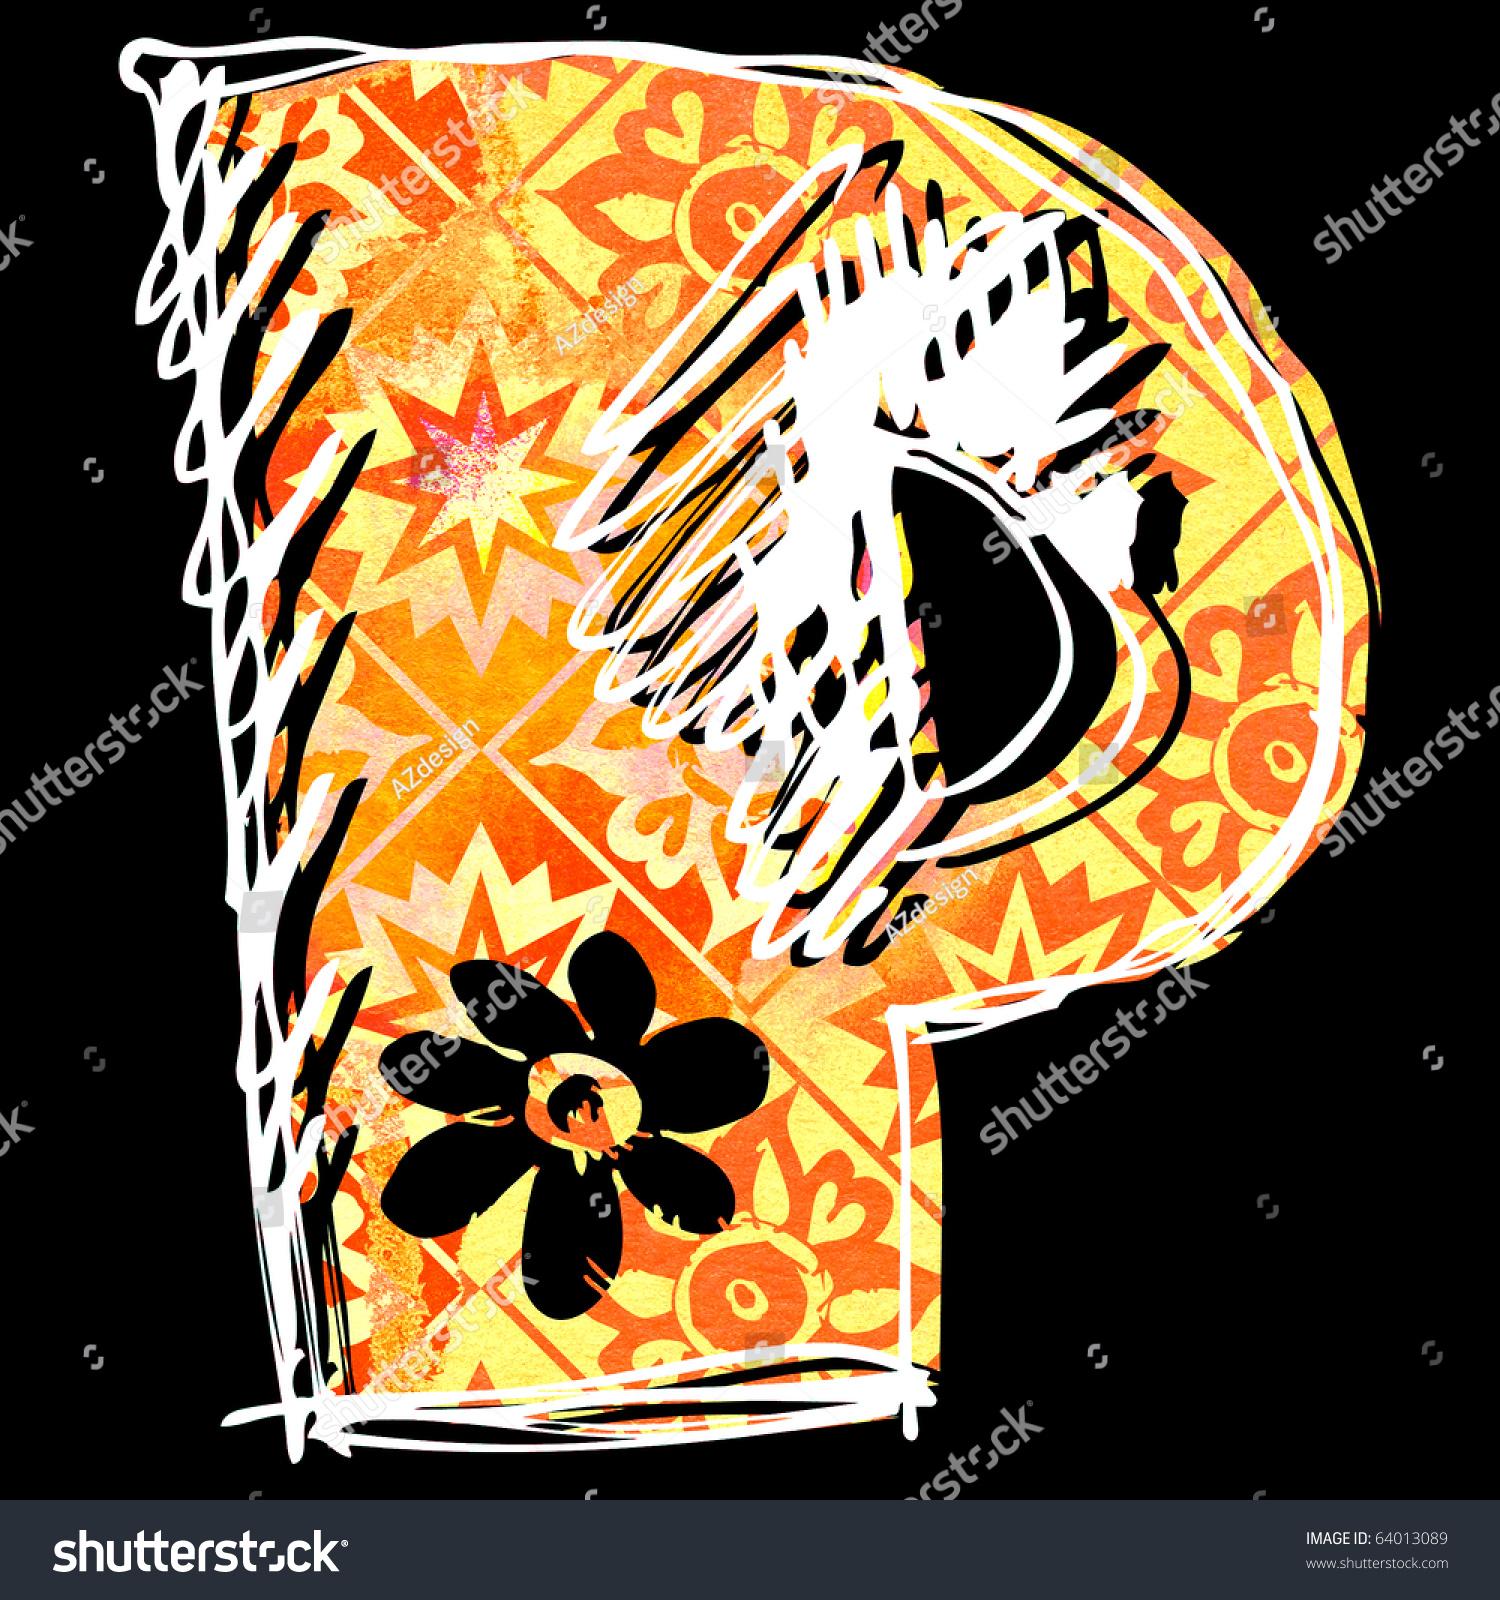 Graffiti alphabet hand drawn letter p isolated on black background